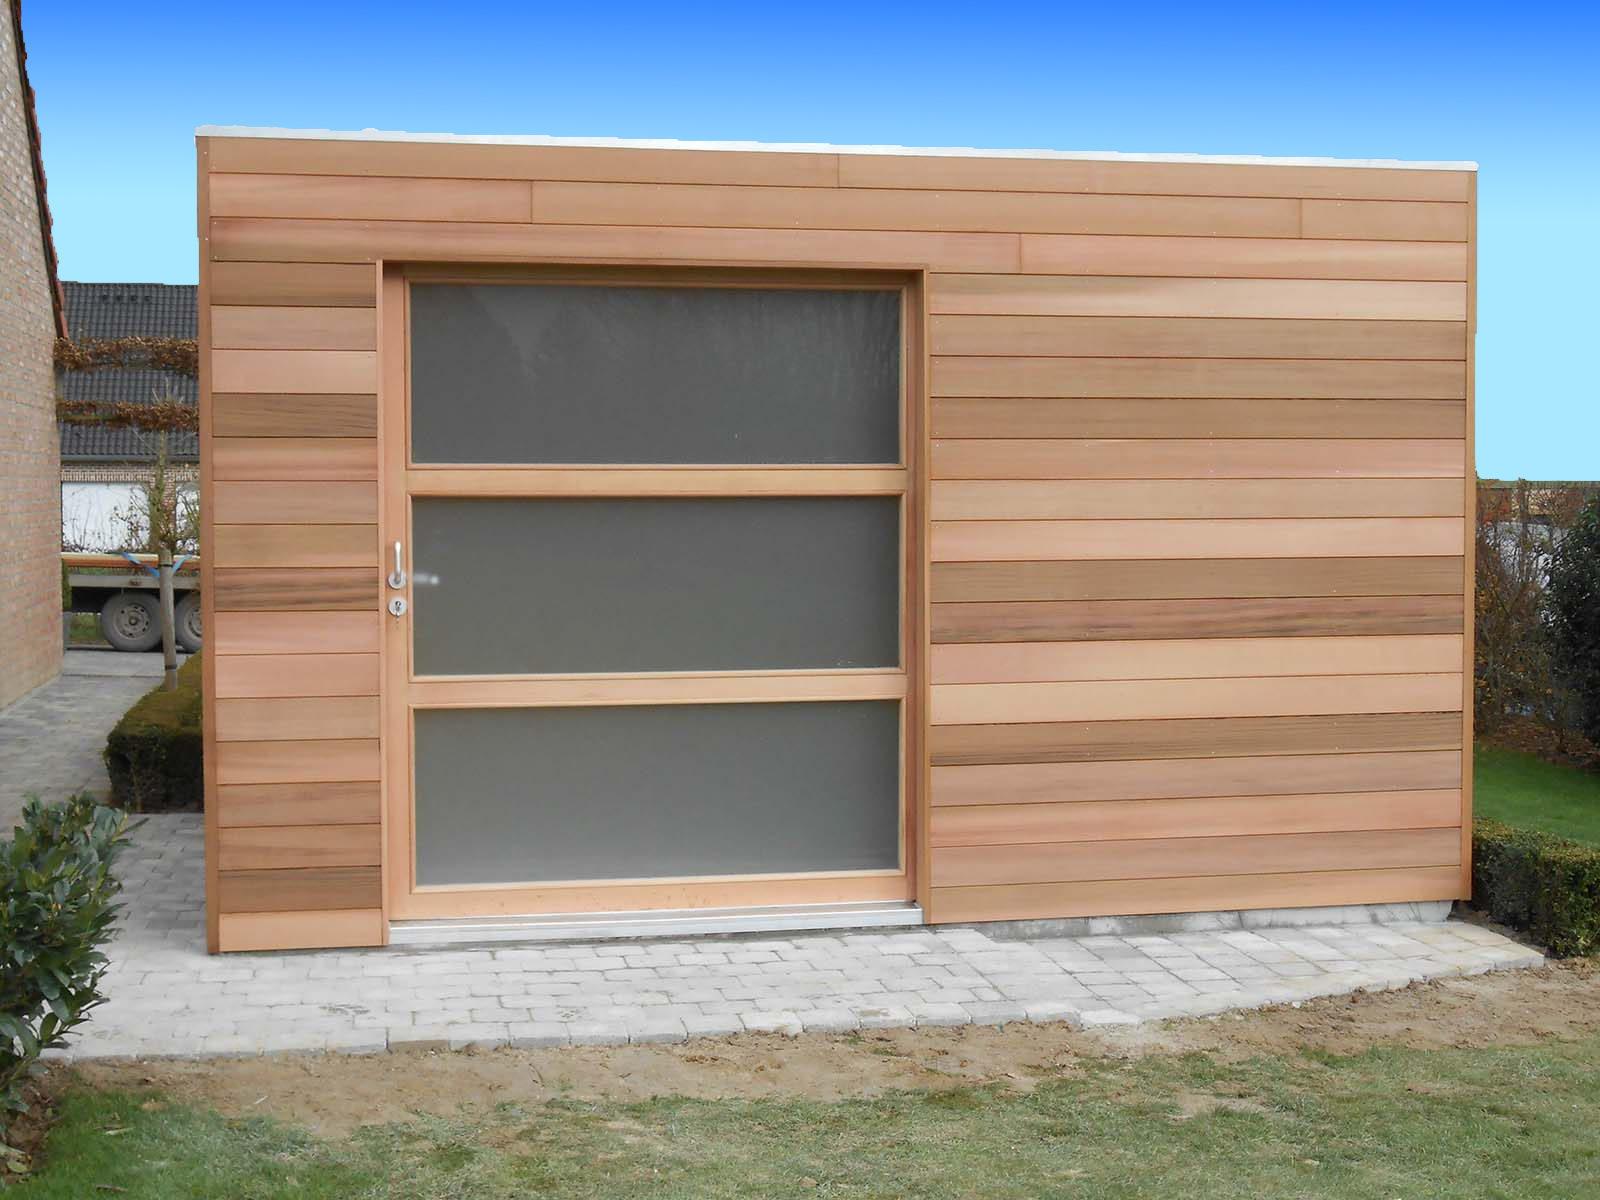 Fabricant Abri De Jardin Moderne Quadro - Abri Toit Plat ... destiné Abri Jardin Moderne